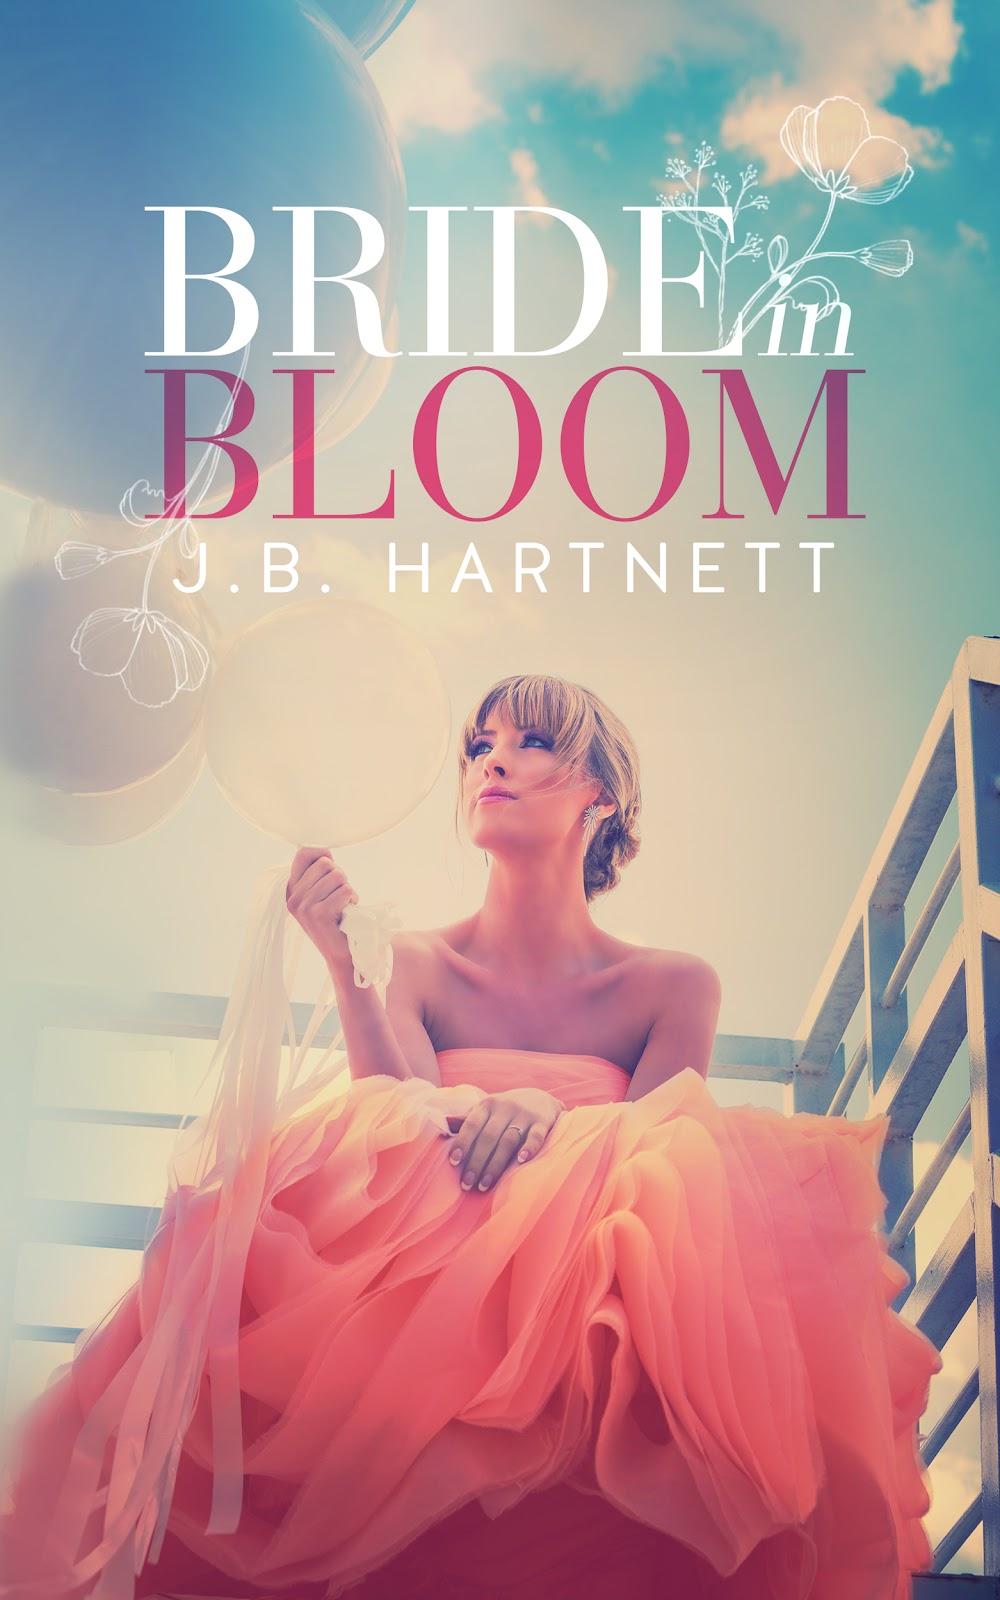 BRIDE IN BLOOM JB HARTNETT AMAZON KINDLE EBOOK COVER.jpg